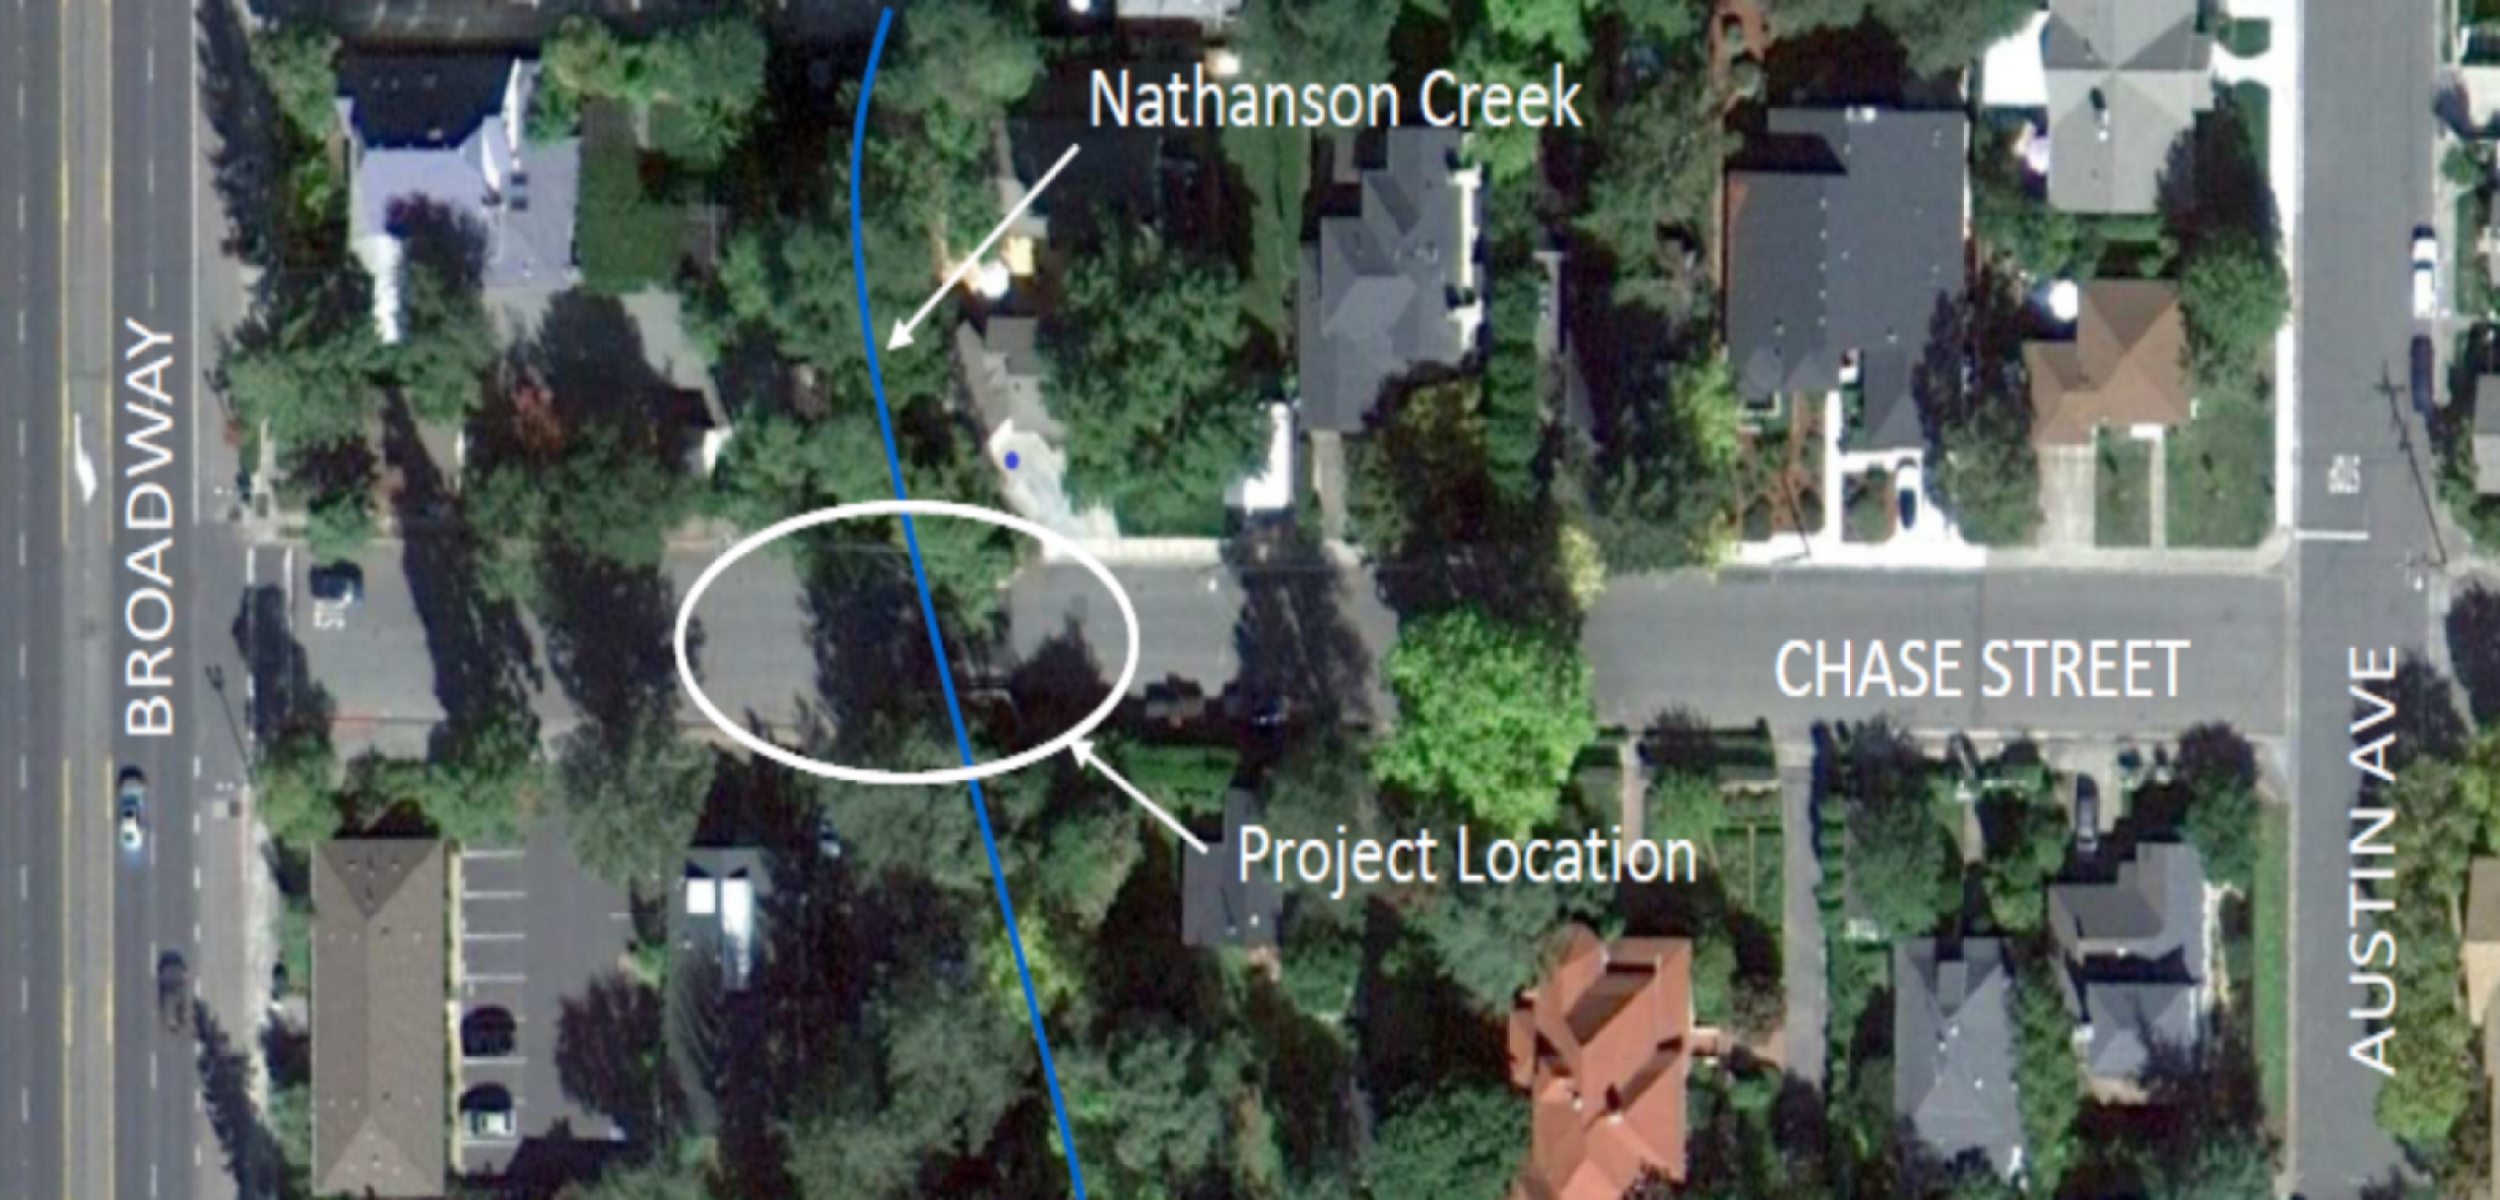 Chase Street Bridge Location